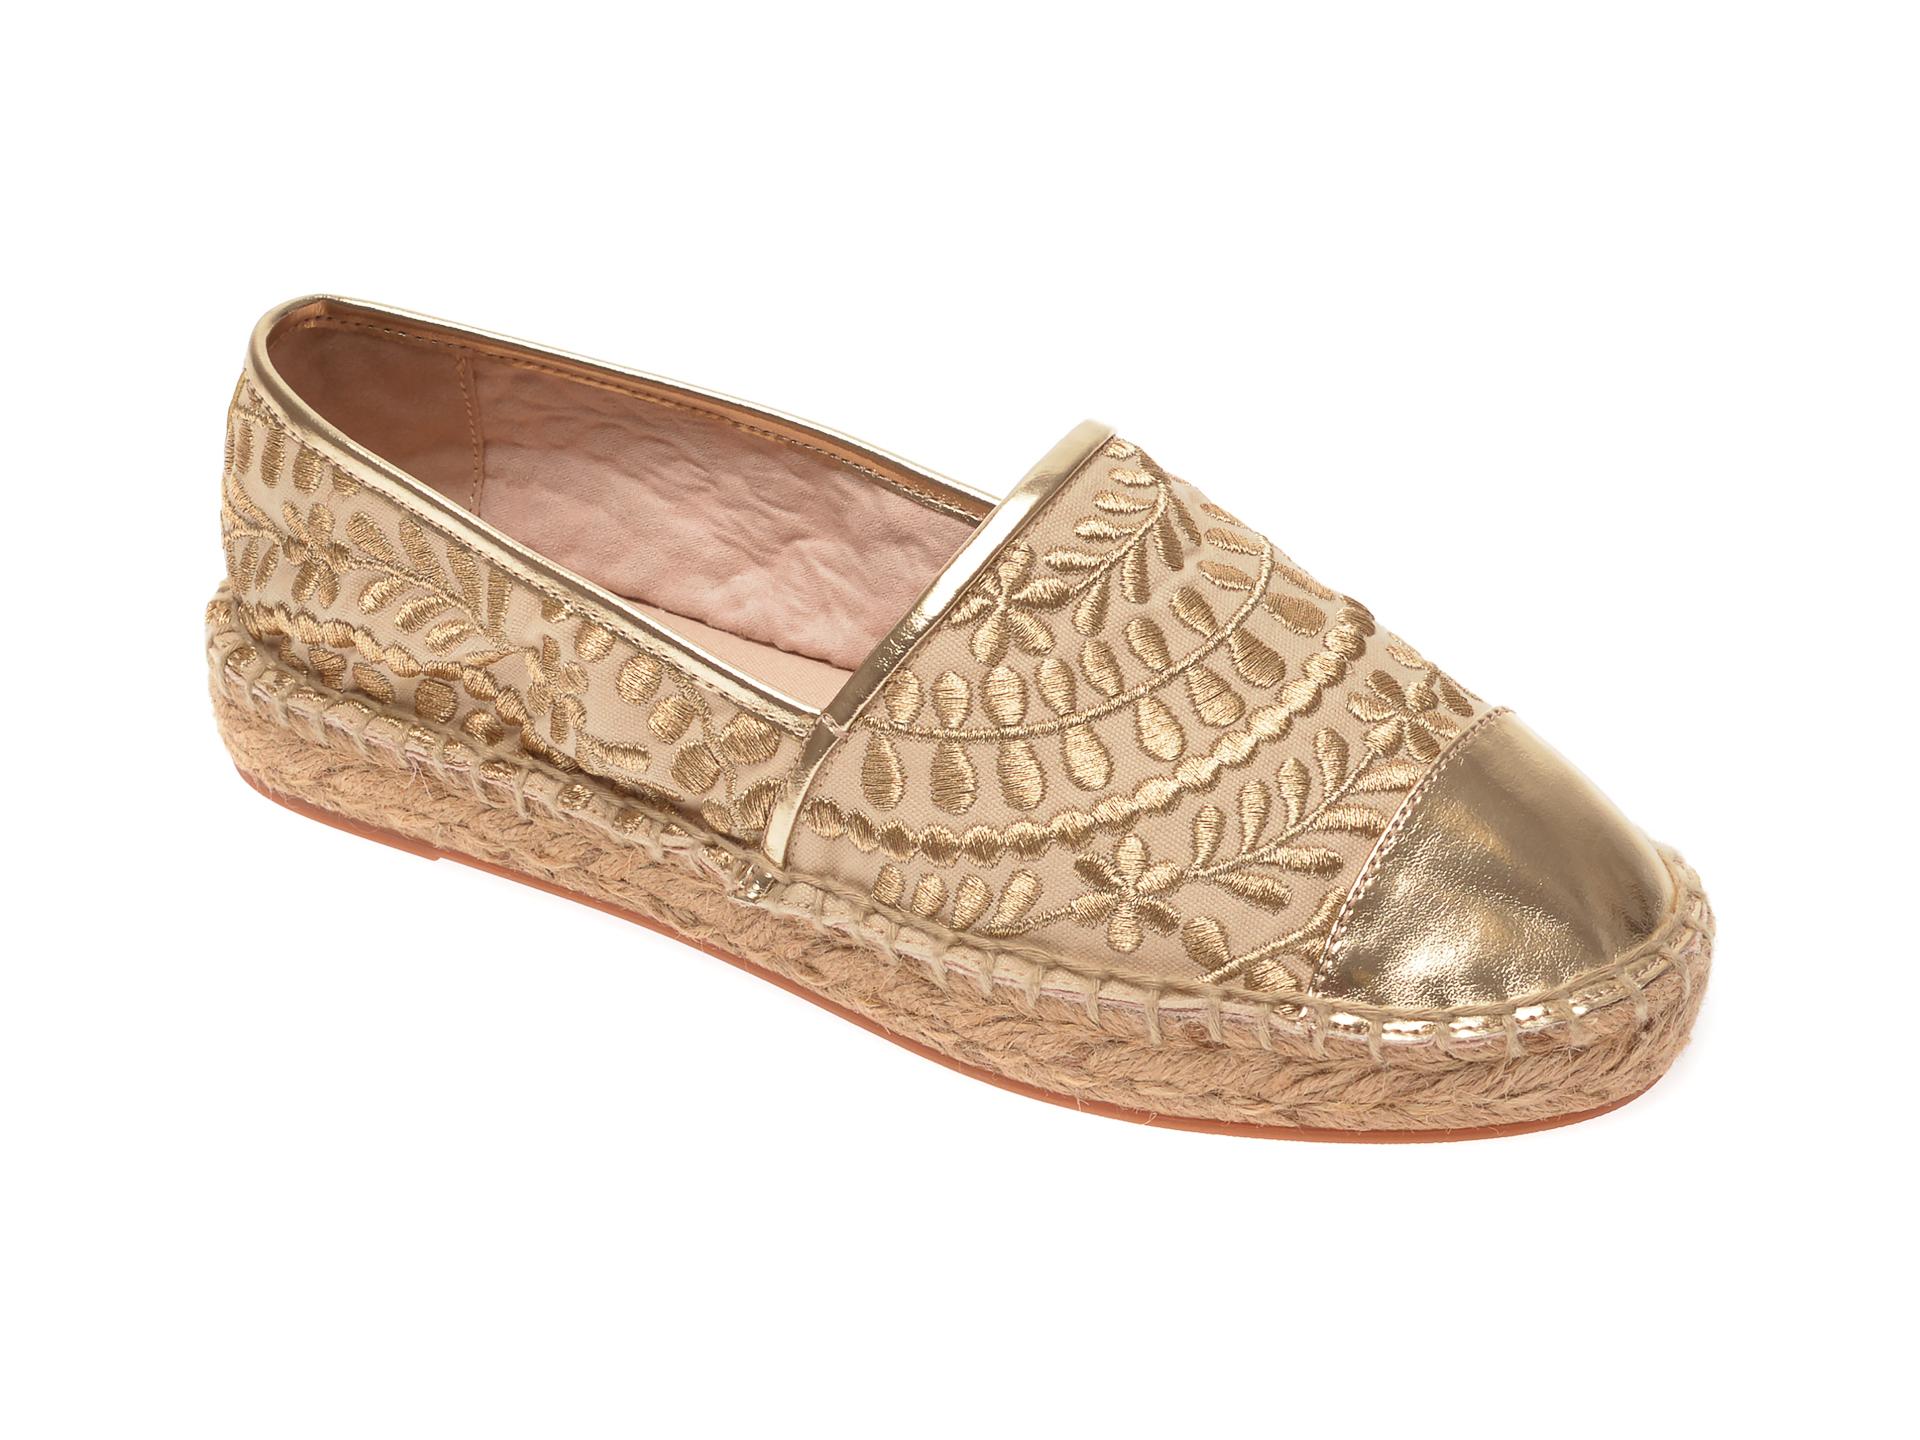 Espadrile ALDO aurii, Cinco710, din material textil